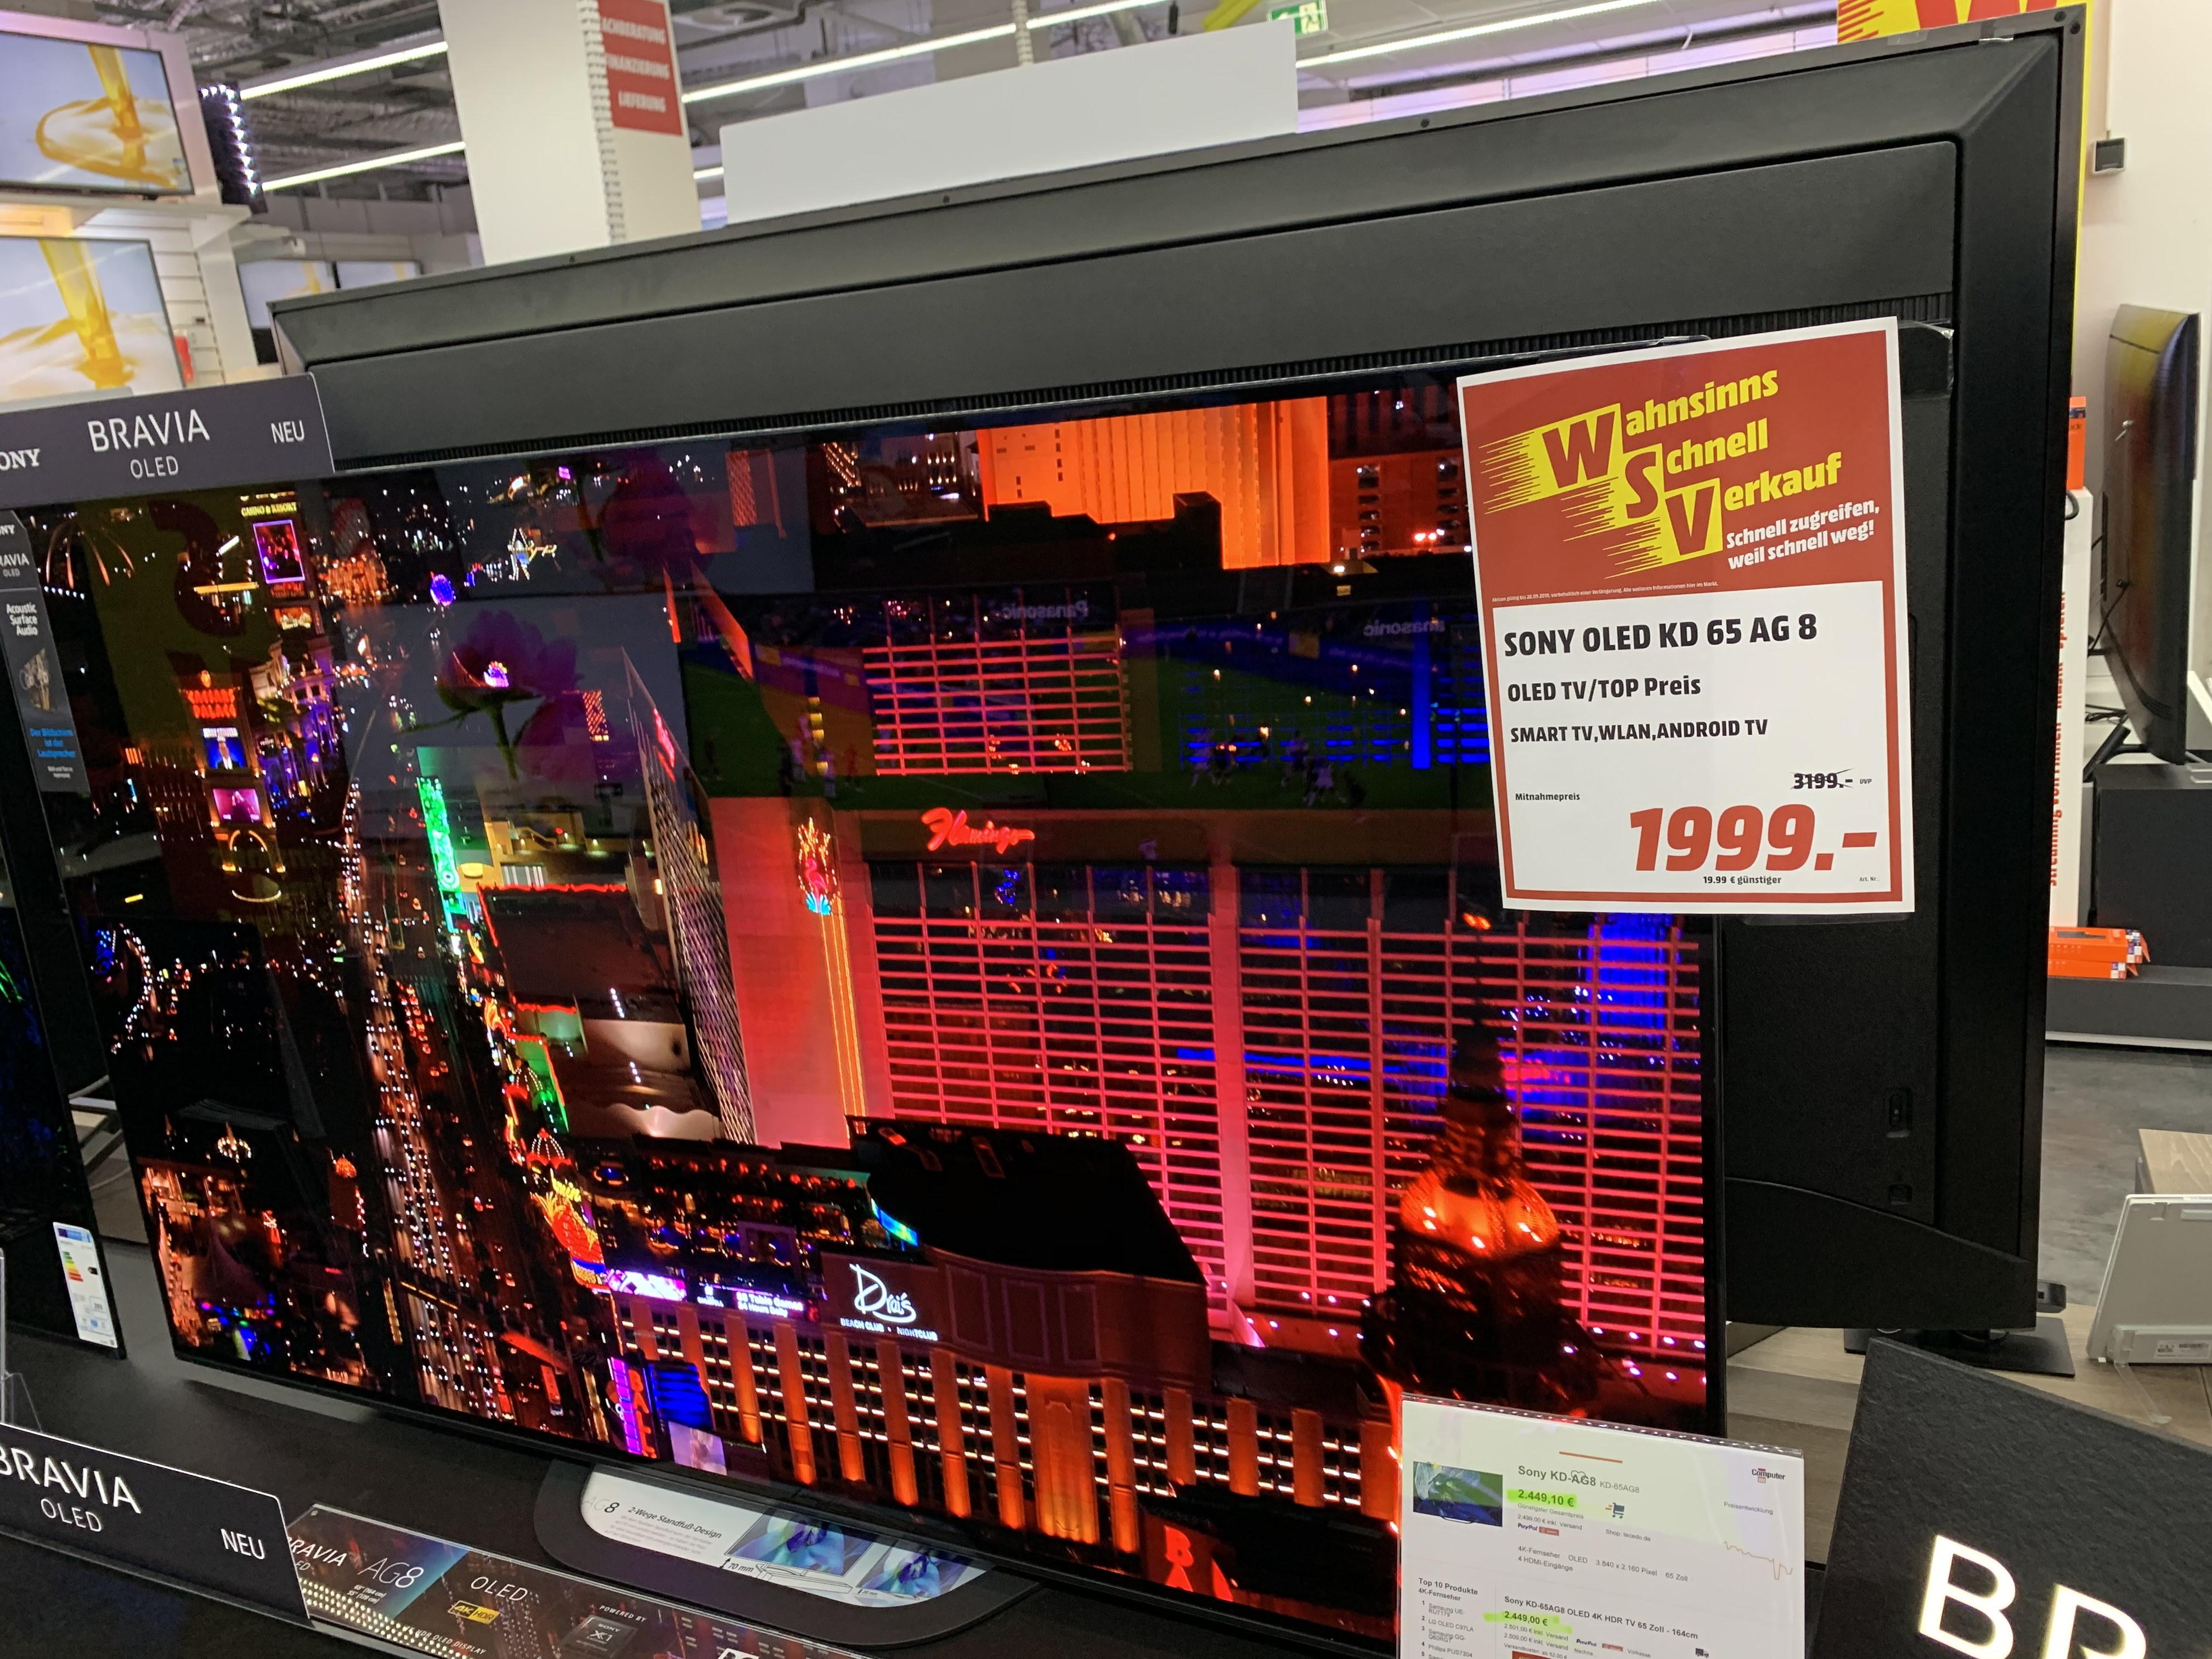 Sony OLED TV 4K 65 Zoll KD65AG8 MM Köln Hohe Str.121